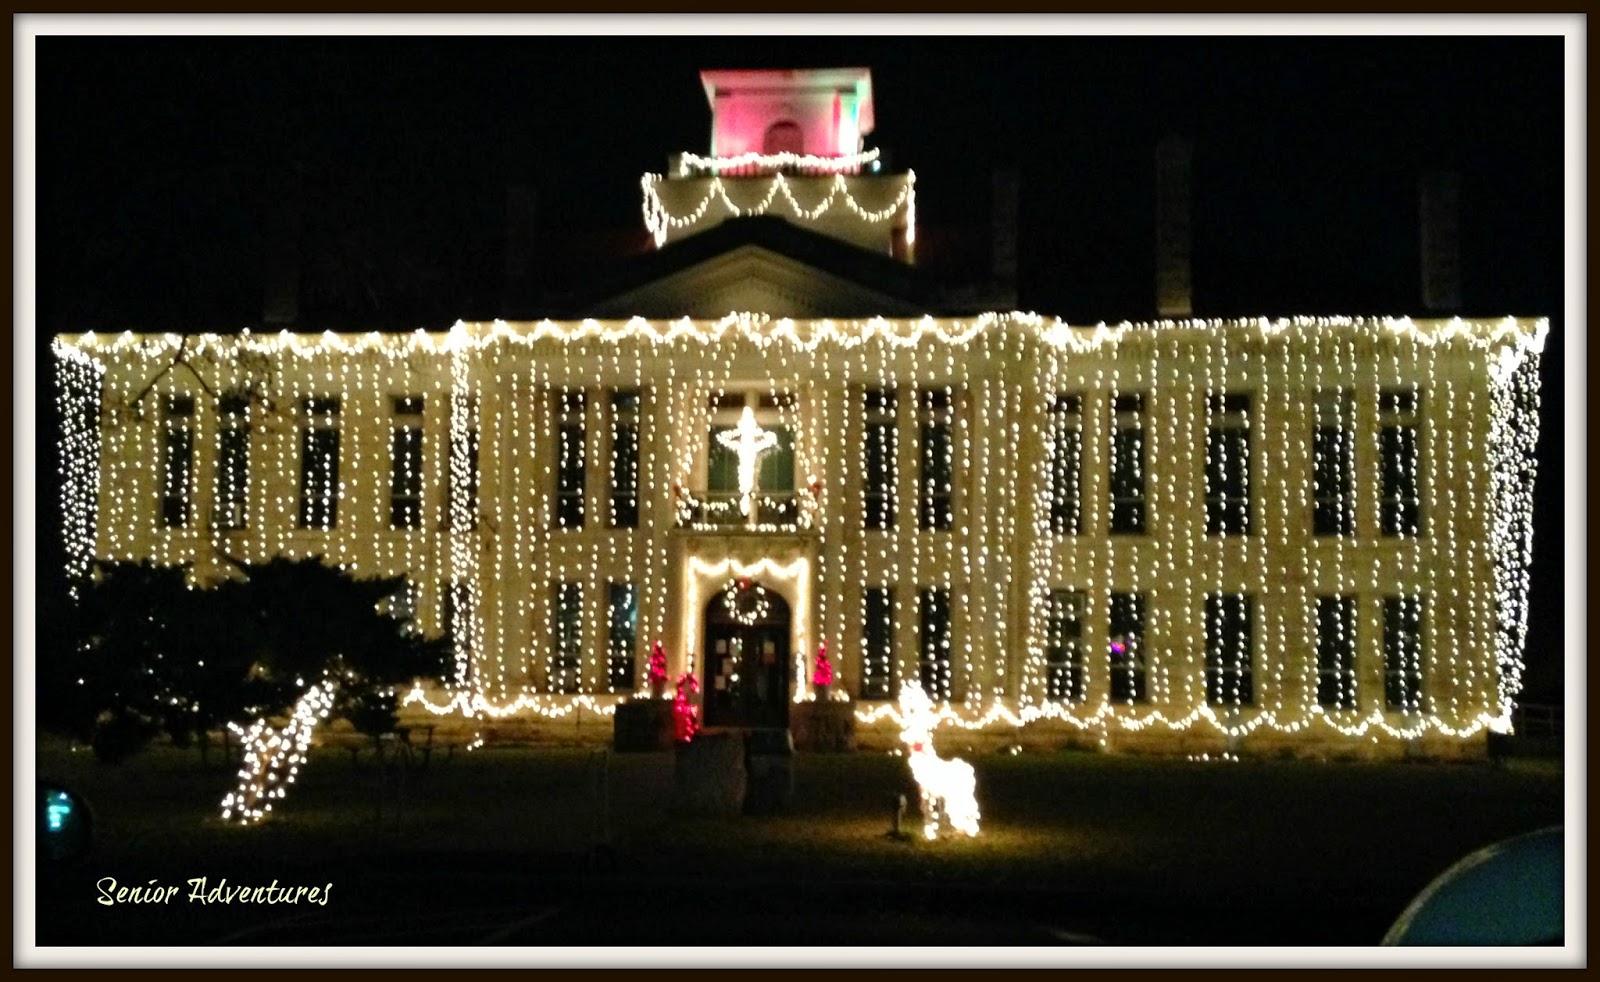 Senior Adventures: Lights in Johnson City